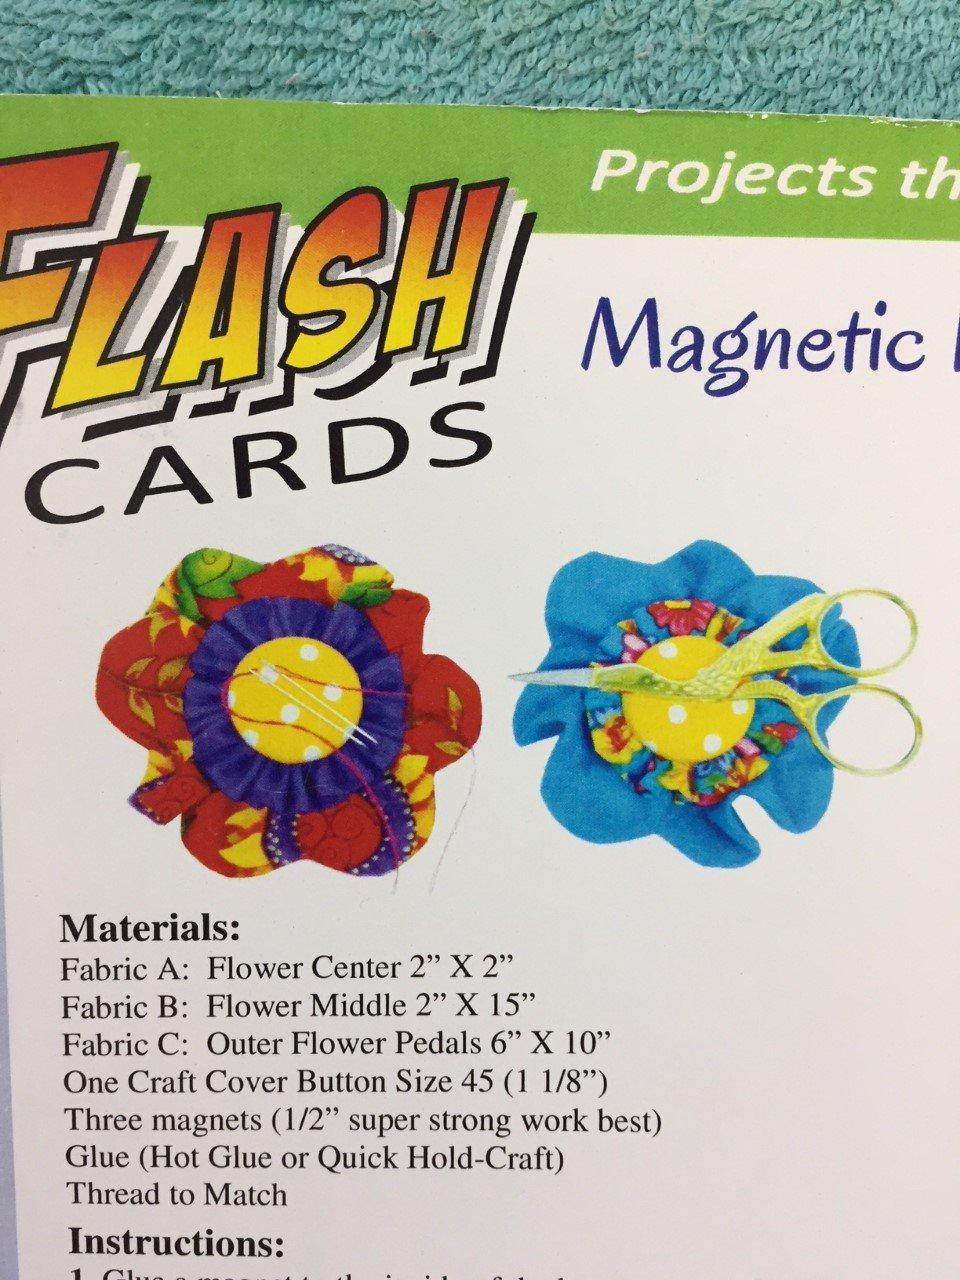 Magnetic Needle-Scissor Holder